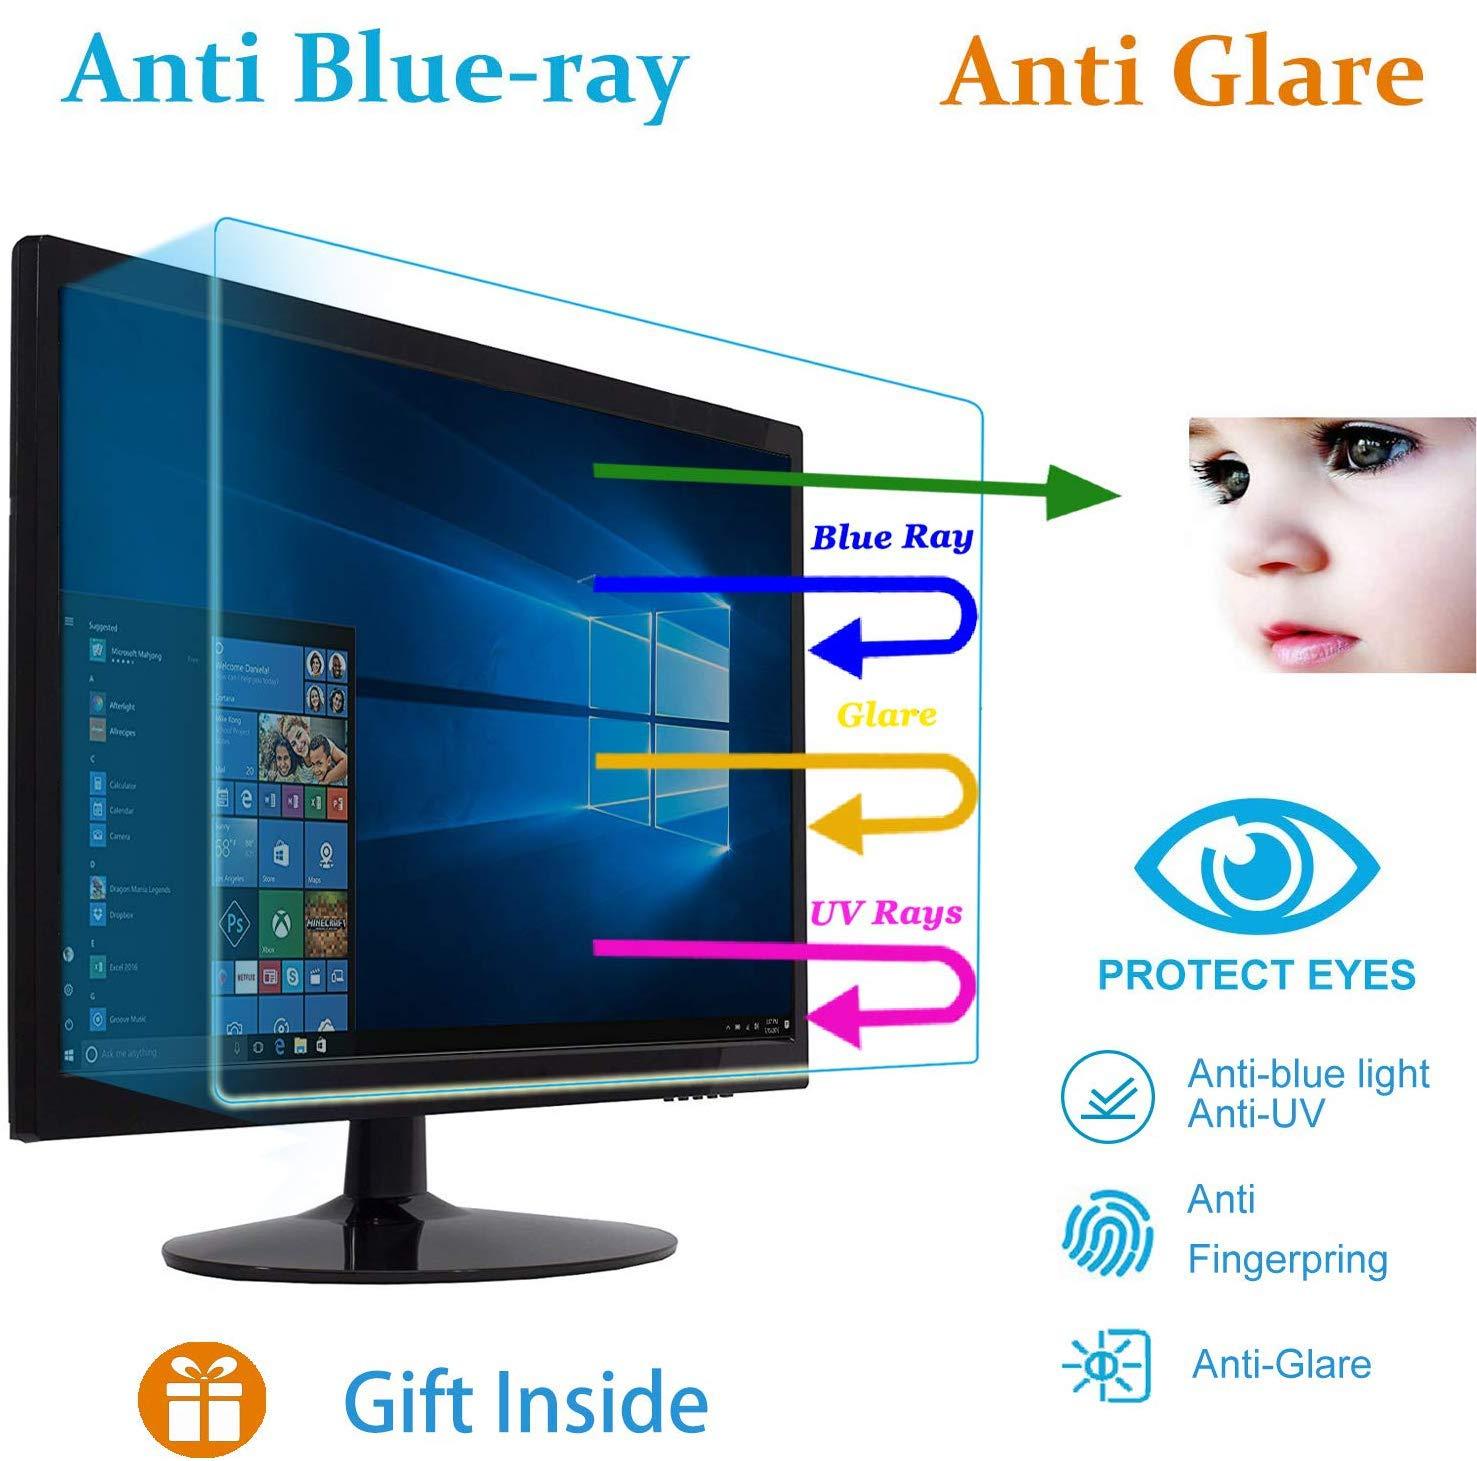 "17InchUniversalAntiGlareMonitorScreenProtectorFit17""Diagonal5:4AspectRatio WidescreenDesktopMonitor,ReduceReflectionandEyesStrain(13.3Wx10.6Hinch)"